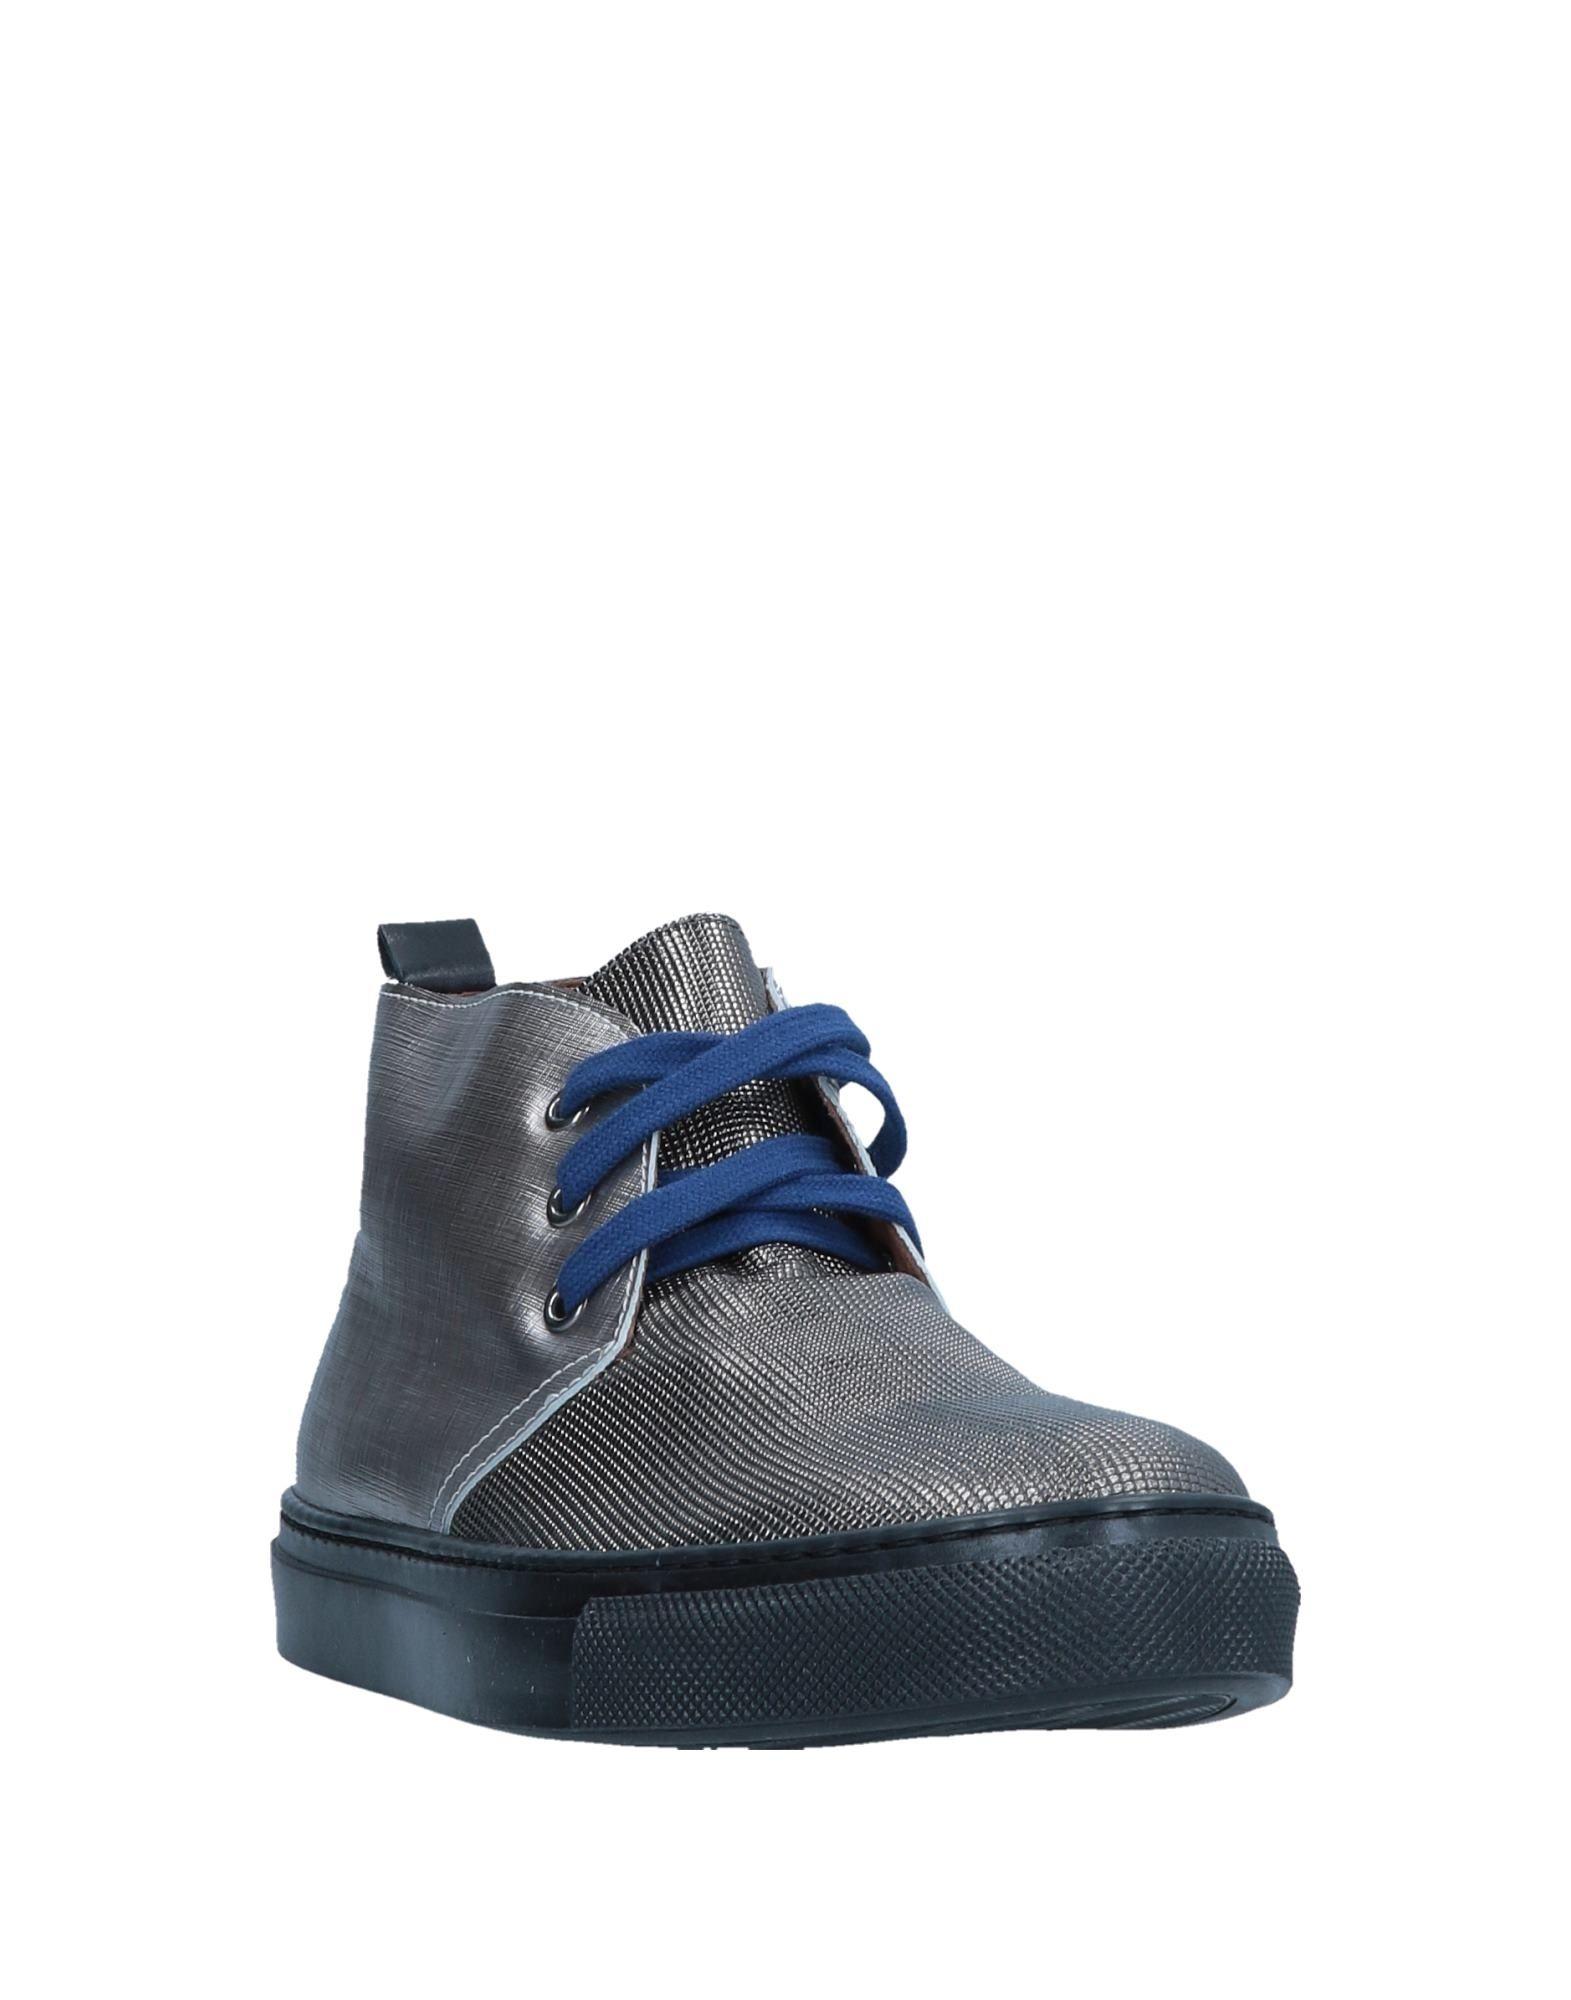 Gut um Stiefelette billige Schuhe zu tragenEbarrito Stiefelette um Damen  11548655QA 5c8a24